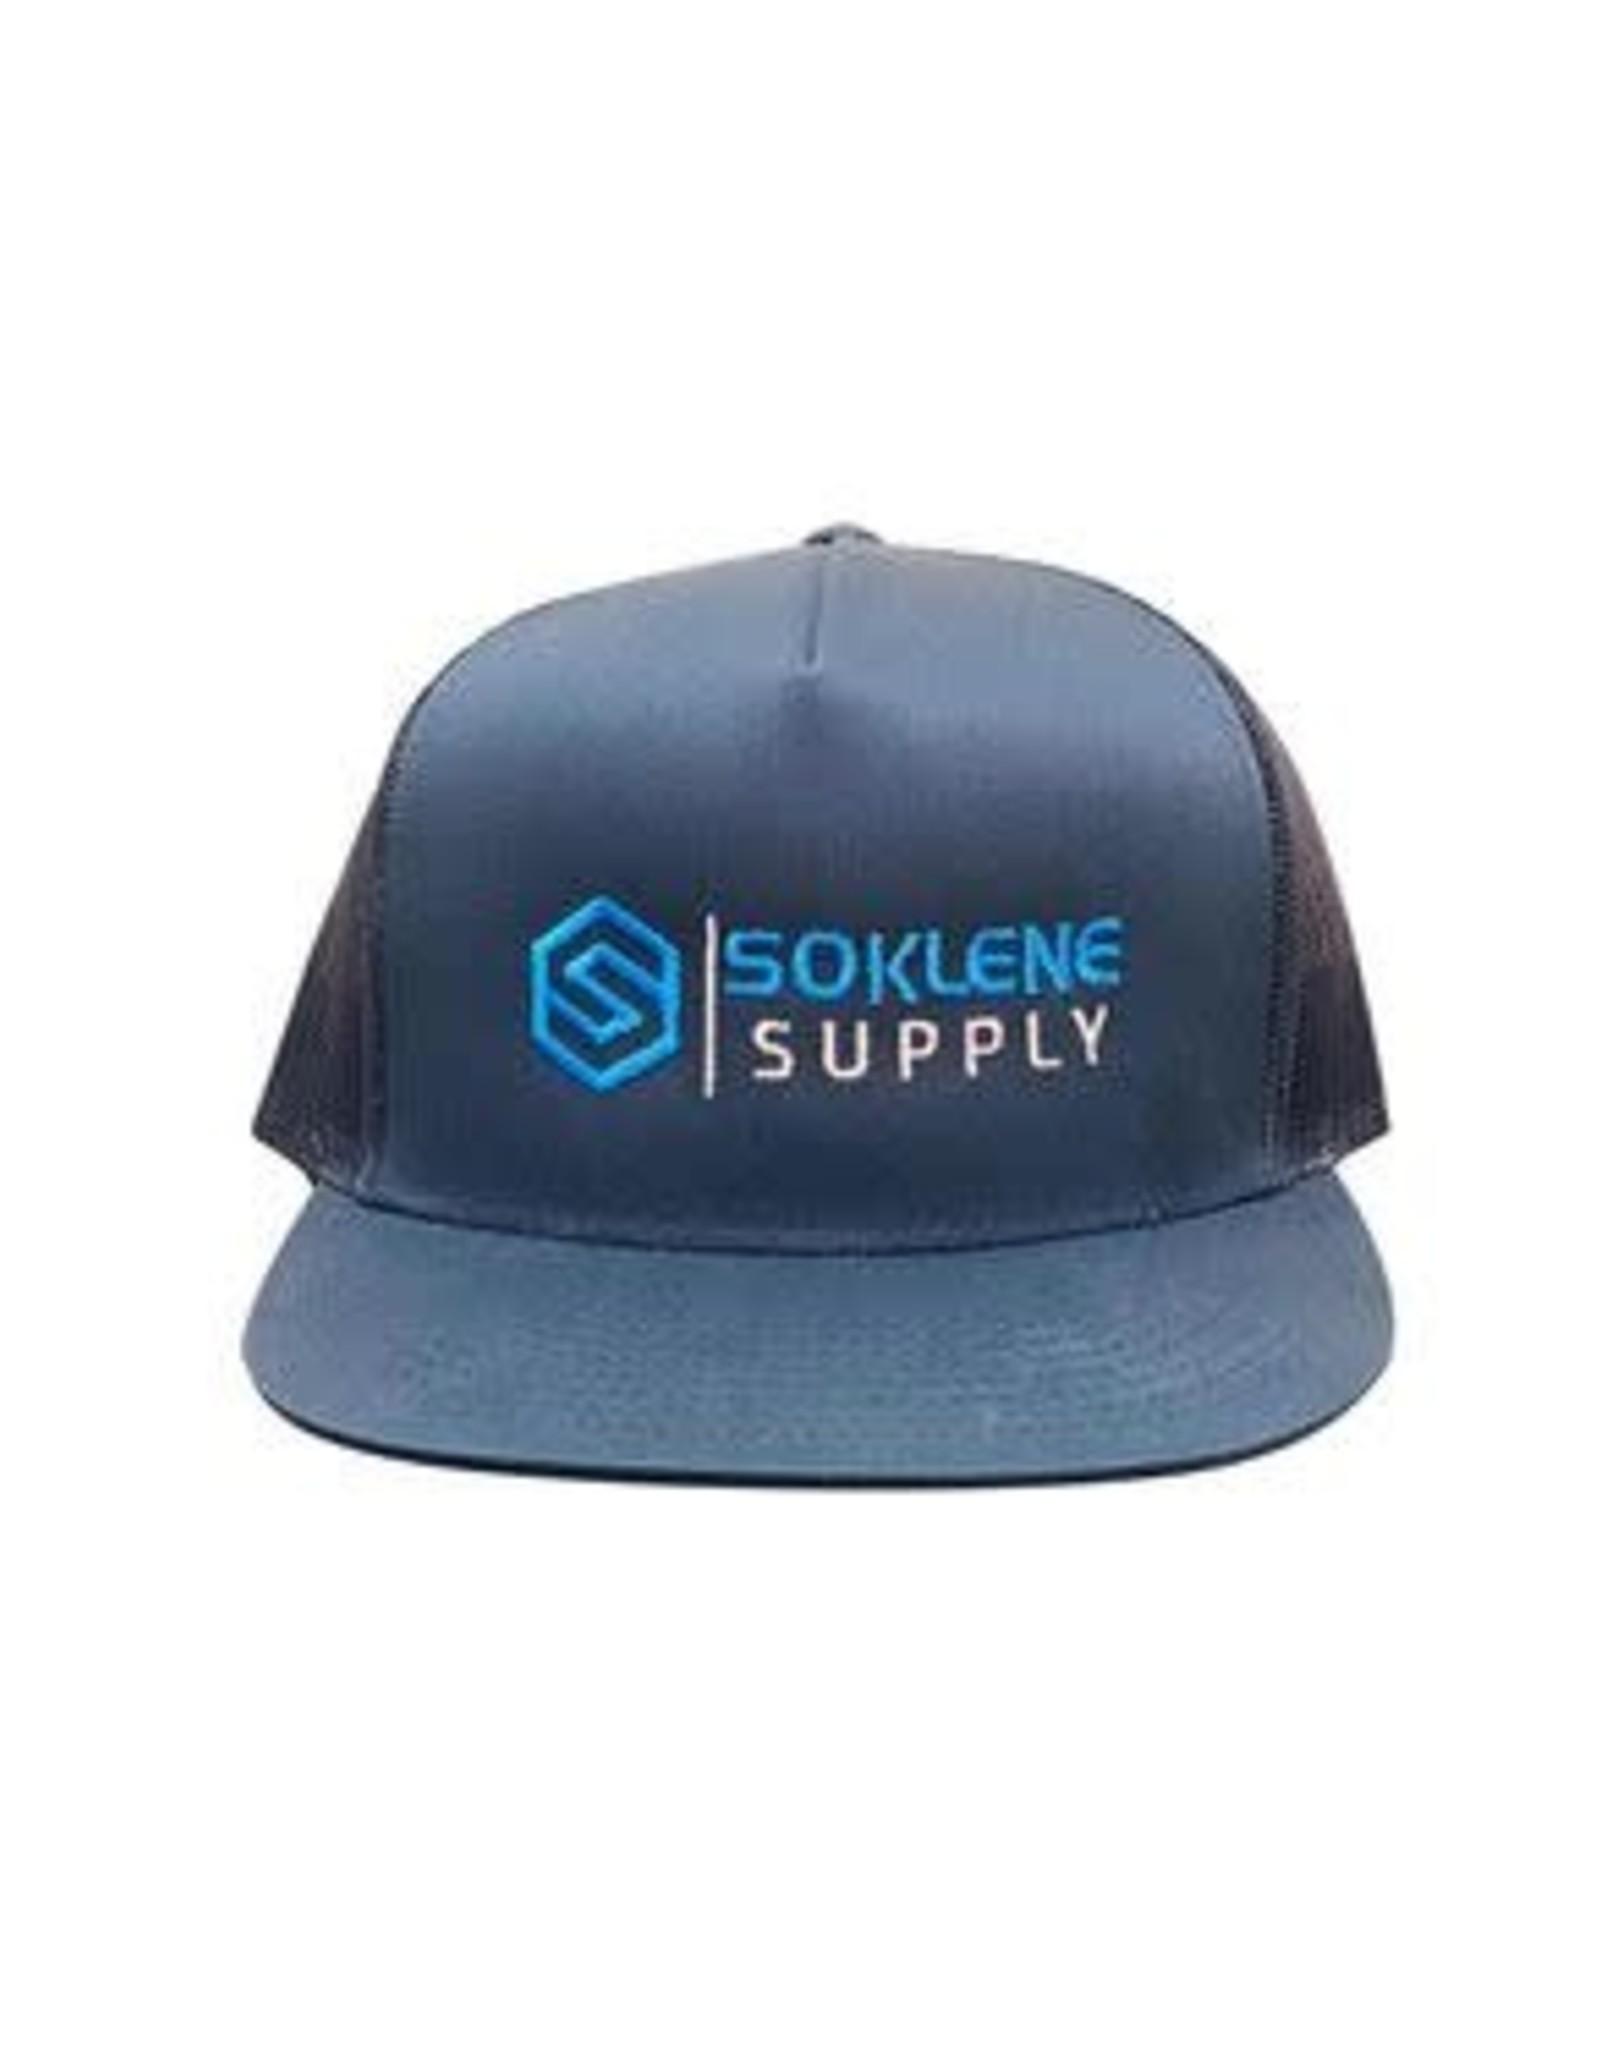 SOKLENE SUPPLY HAT